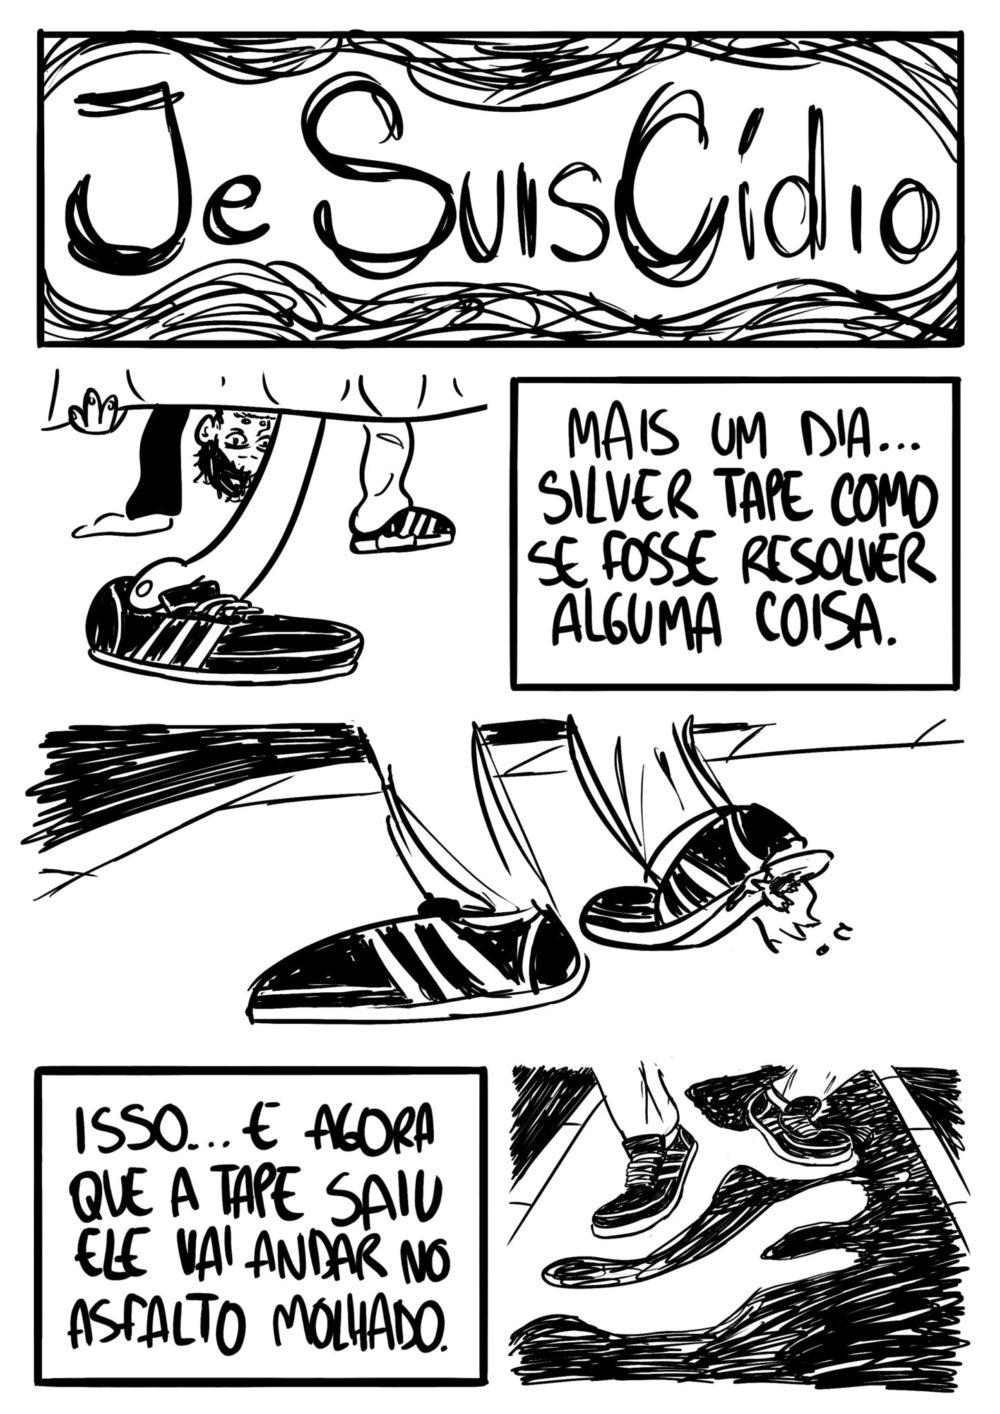 Je Suis Cídio #5, por João B. Godoi